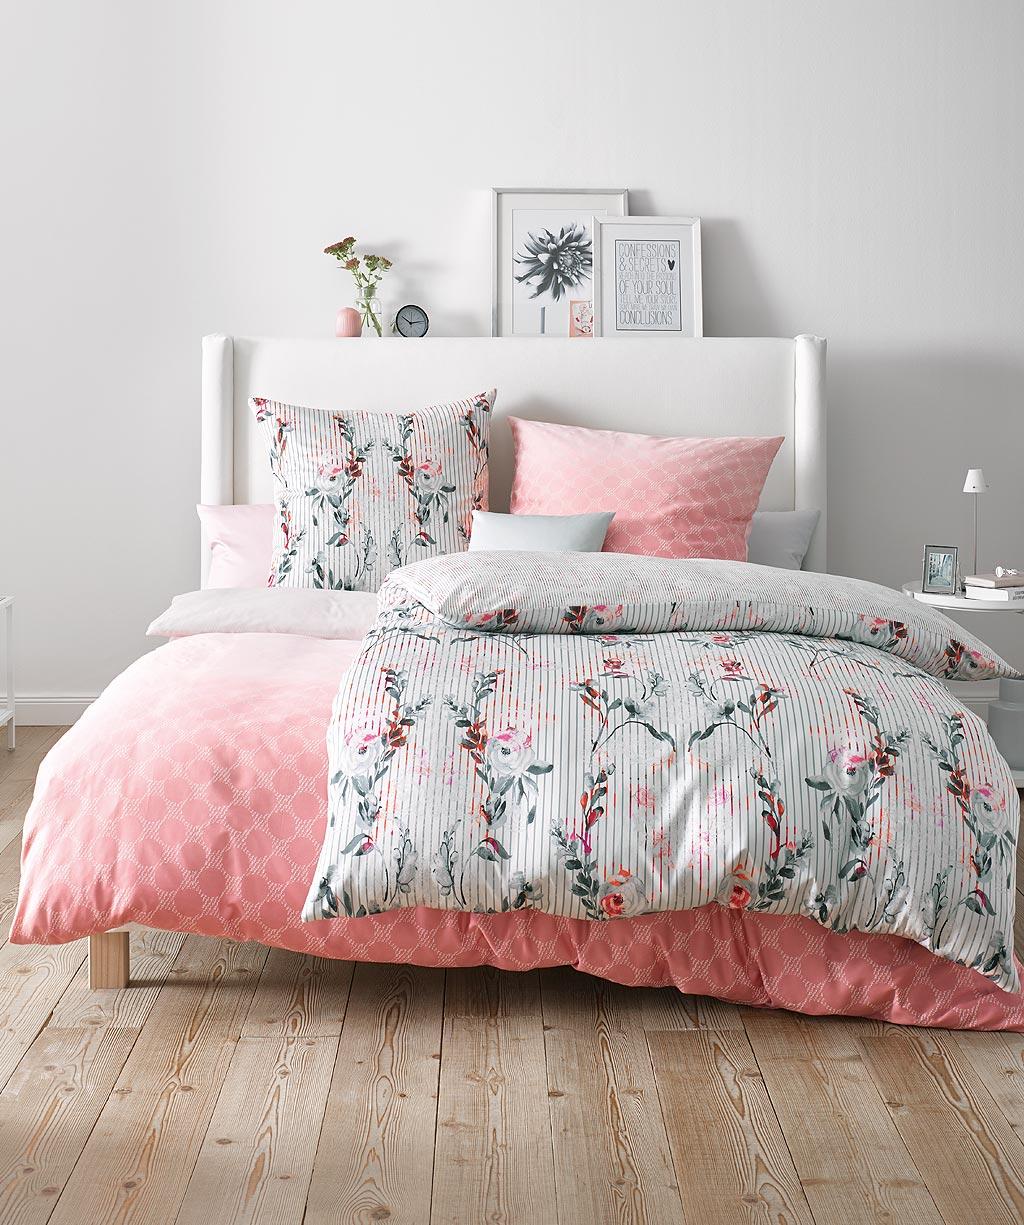 rosa mako satin bettw sche xxl gr e 200x220 fleuresse reduziert ladyproject. Black Bedroom Furniture Sets. Home Design Ideas